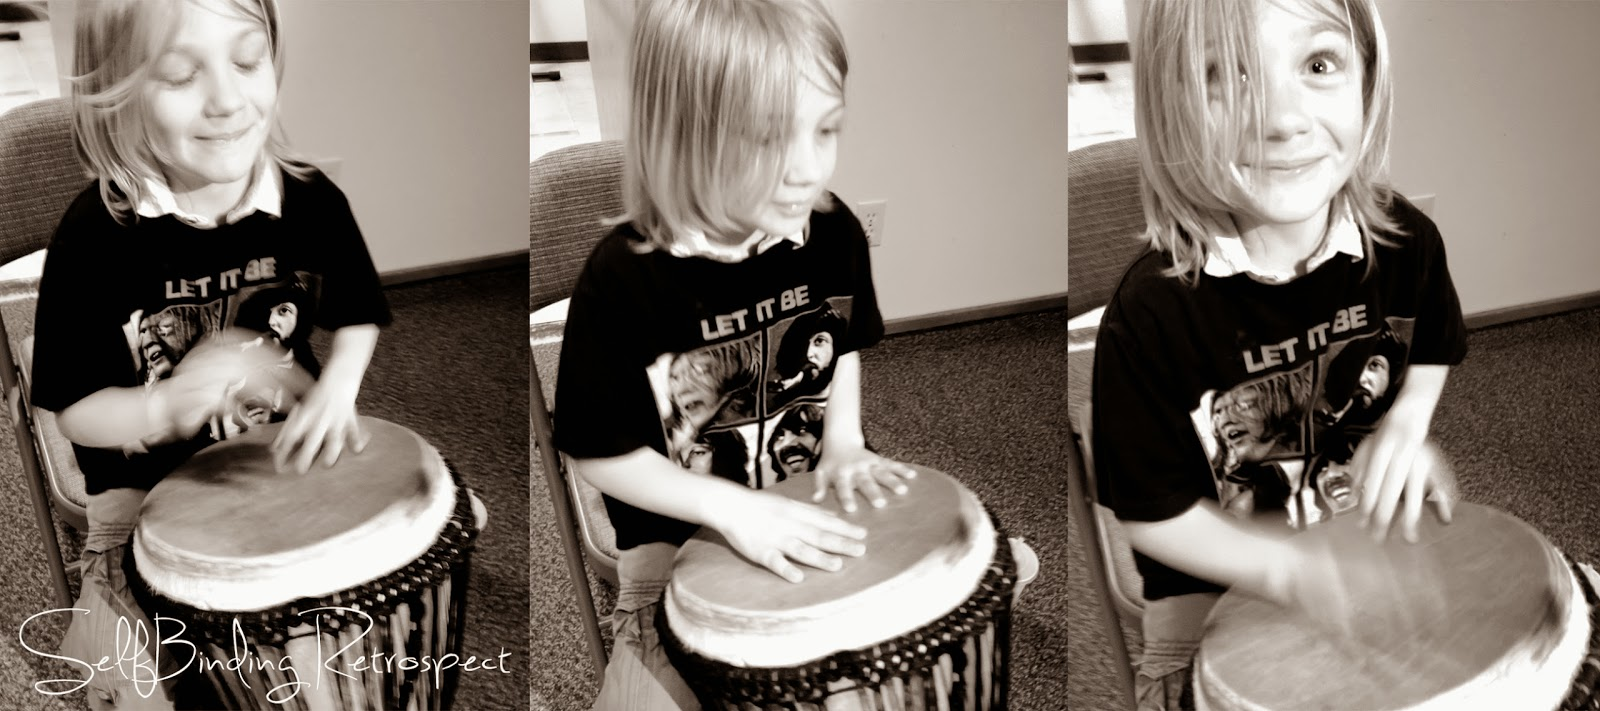 Bang a drum, SelfBinding Retrospect by Alanna Rusnak